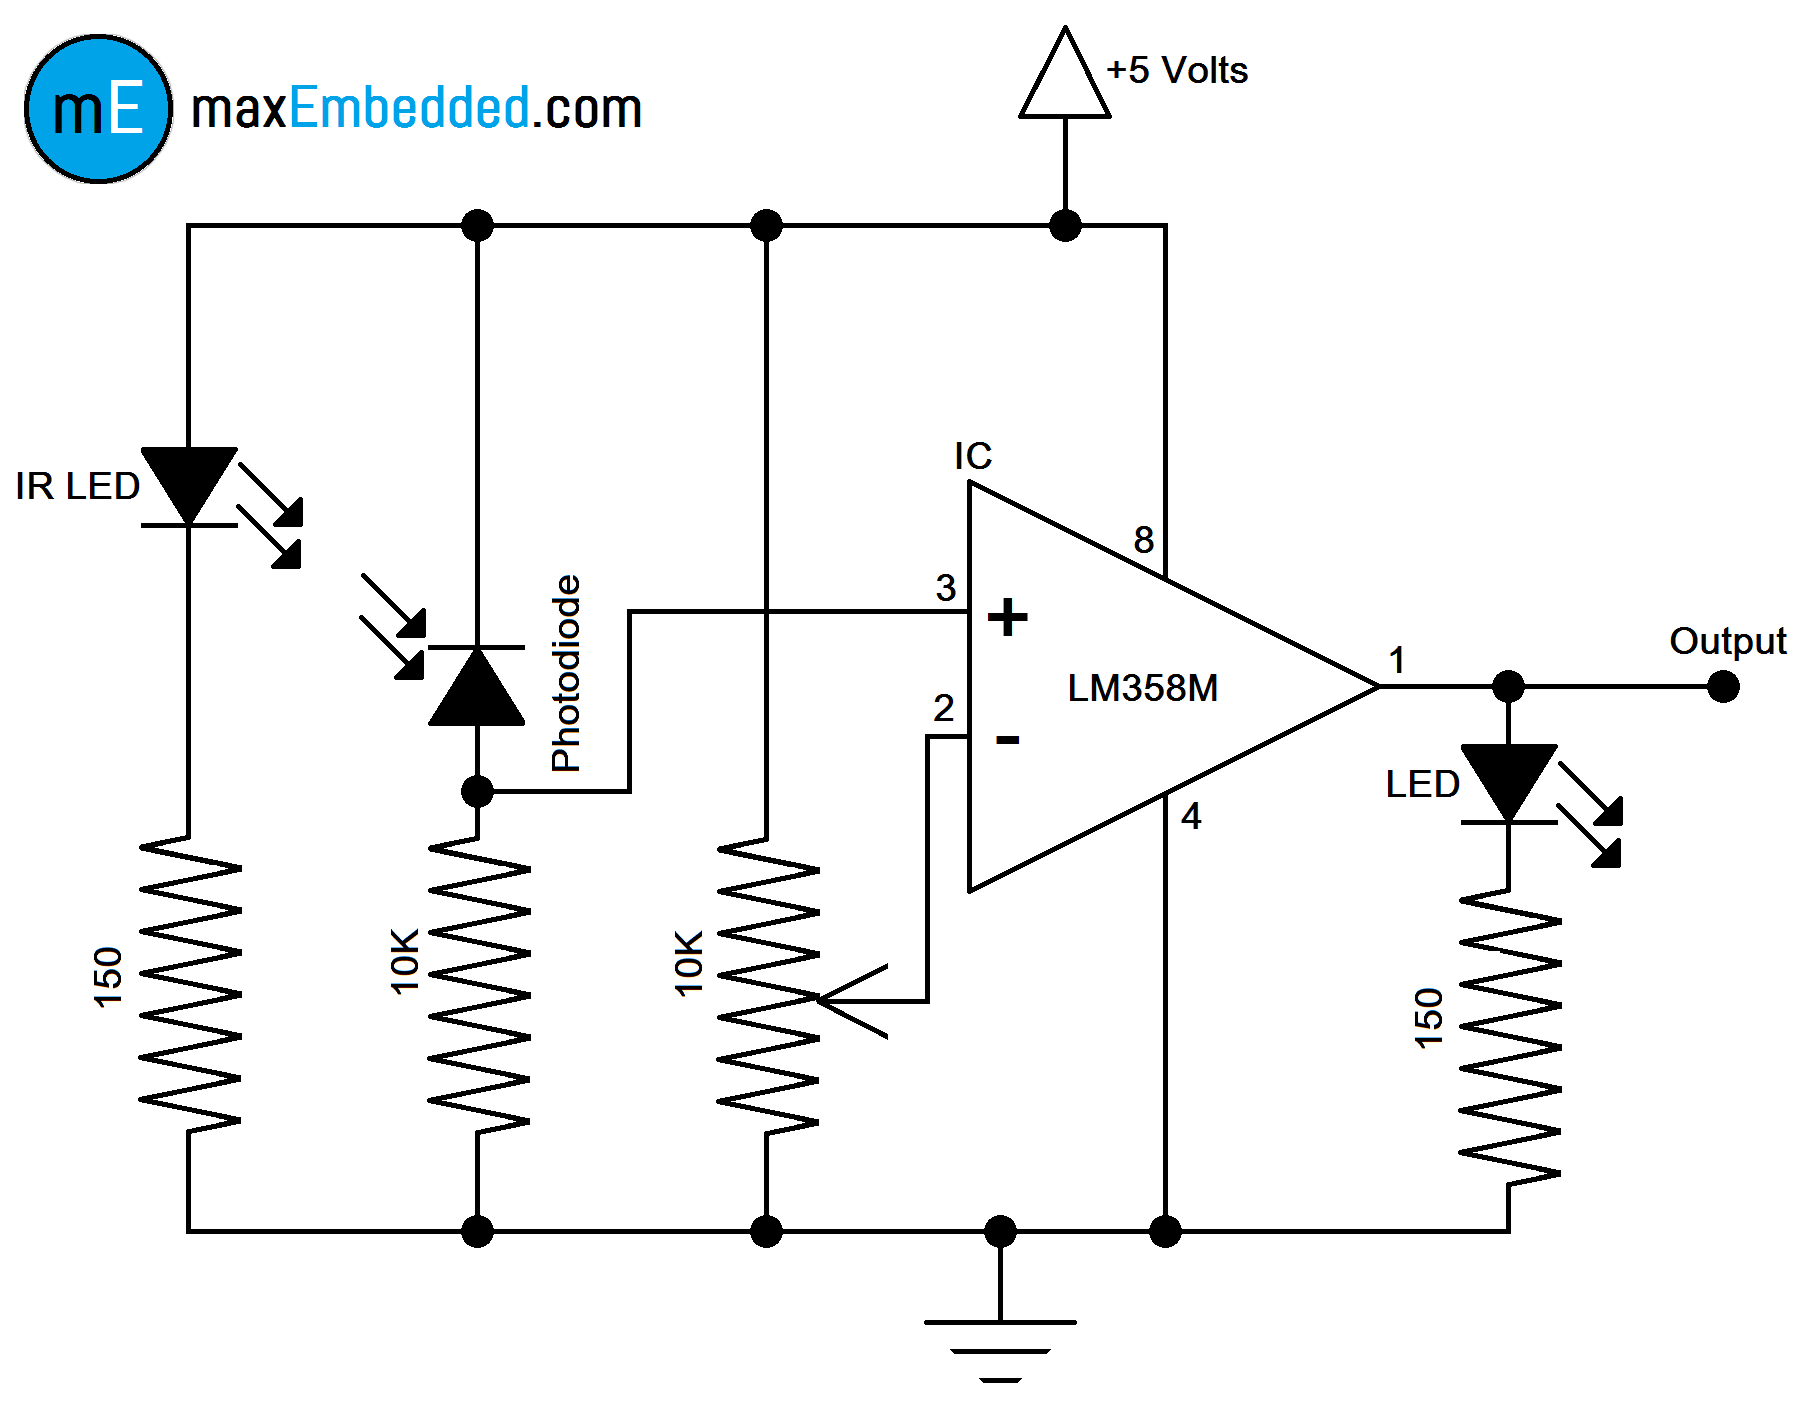 medium resolution of ir sensor circuit schematic wiring diagram online simple ir proximity sensor circuit diagram how to build